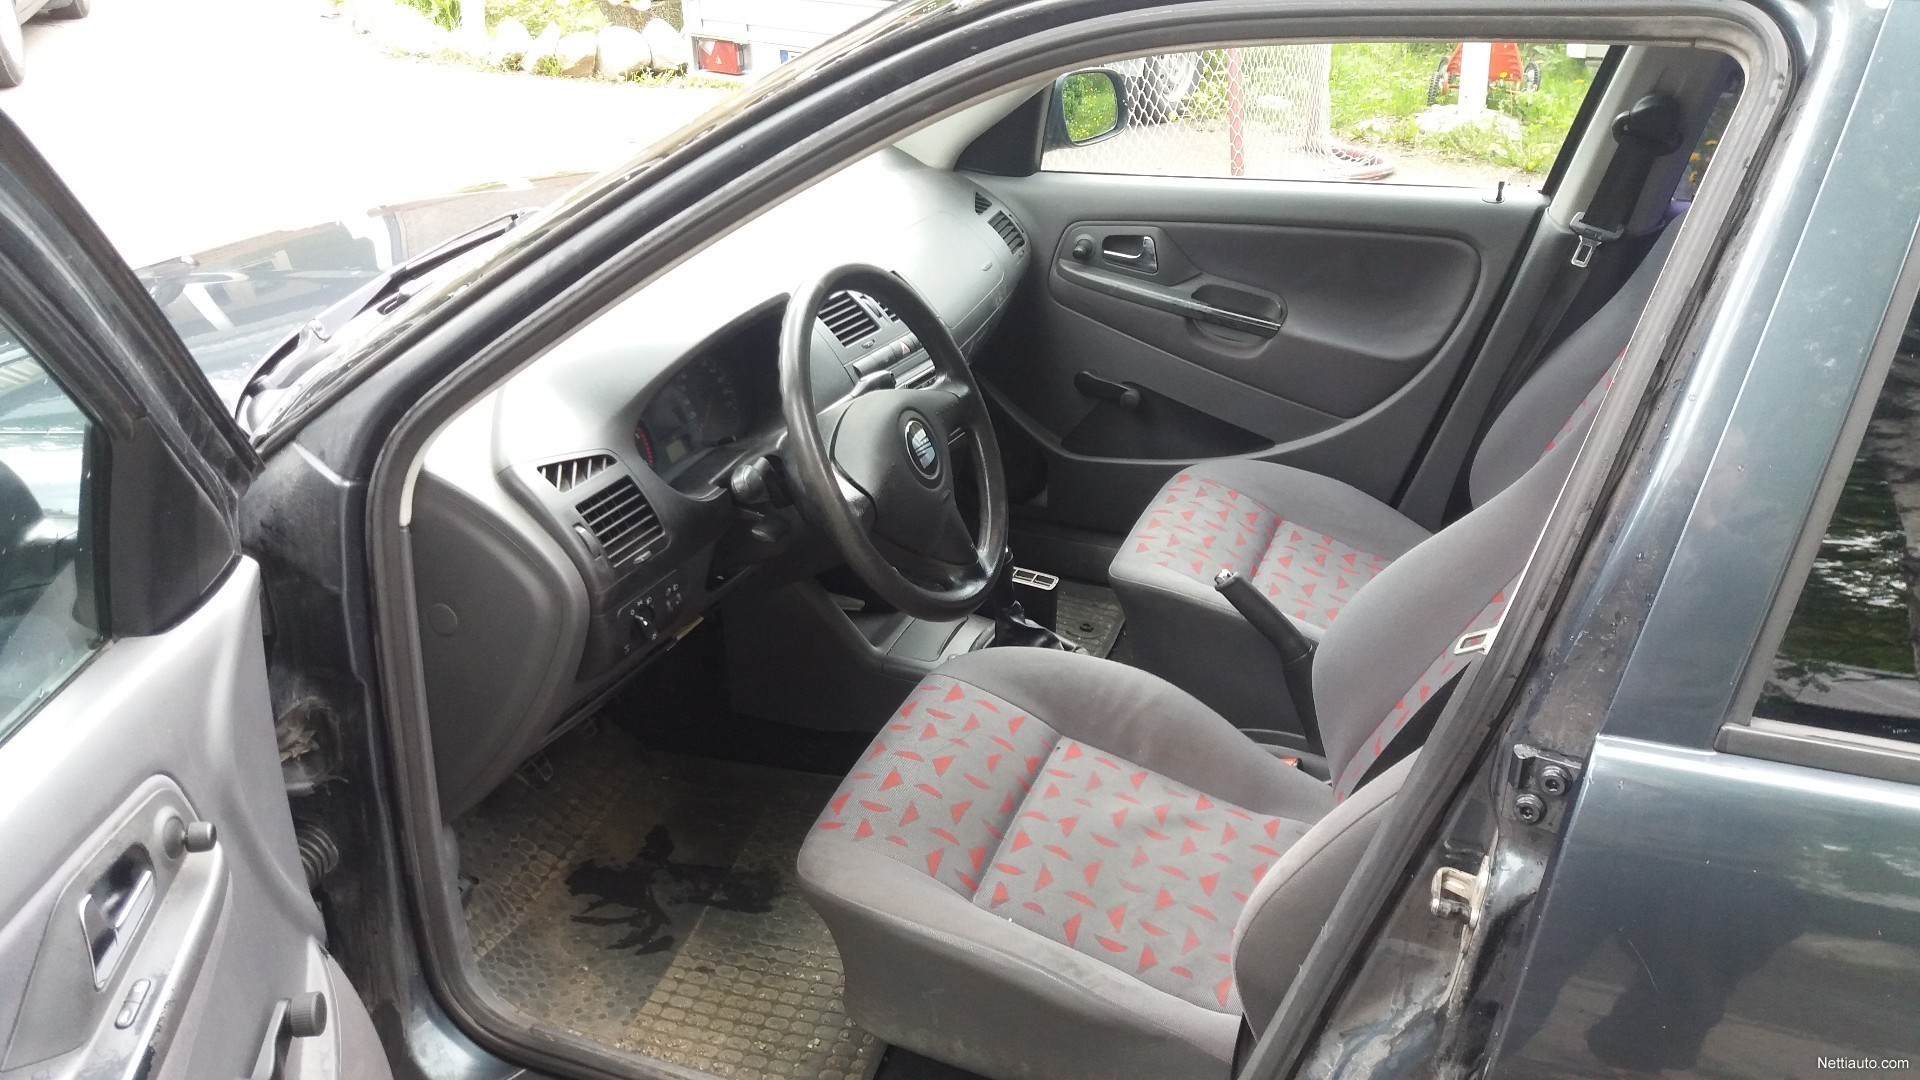 Seat cordoba station wagon 2001 used vehicle nettiauto for Seat cordoba interior